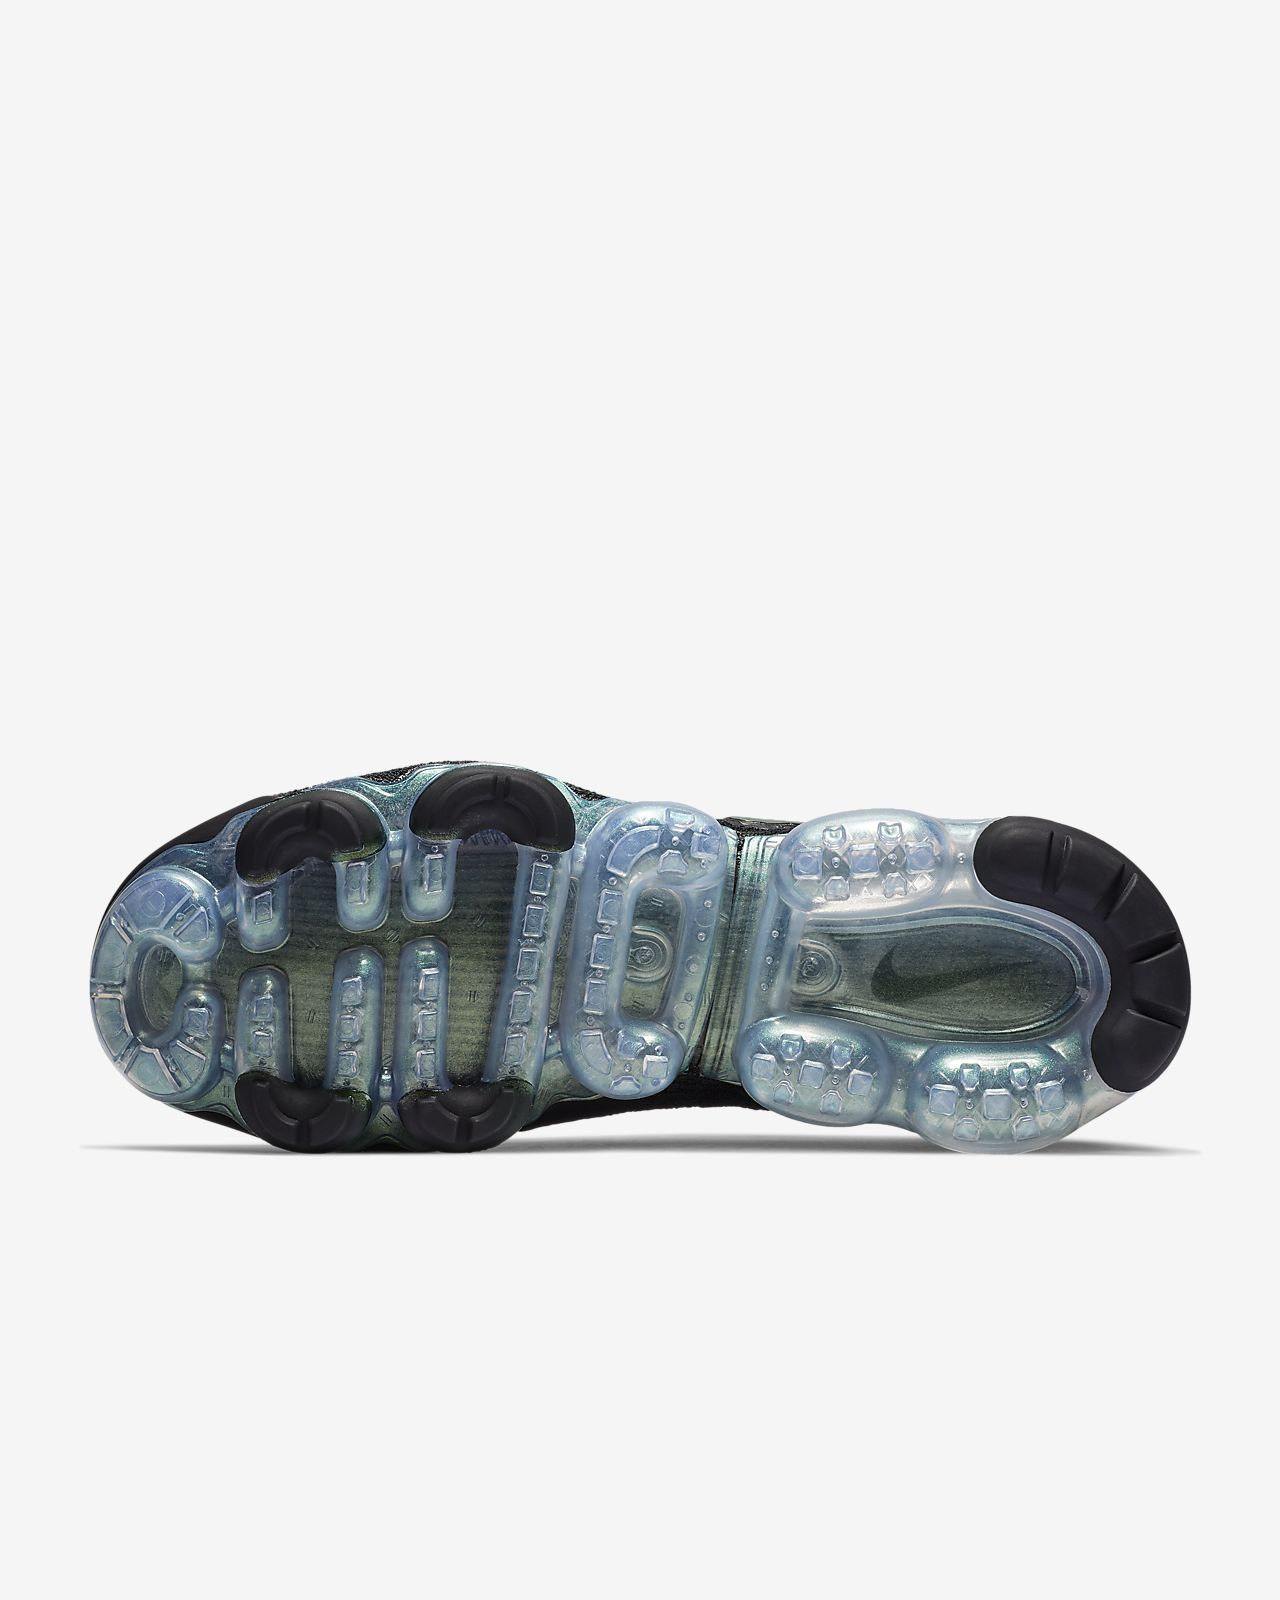 93c9fcc568 Nike Air VaporMax Flyknit 2 Shoe. Nike.com GB